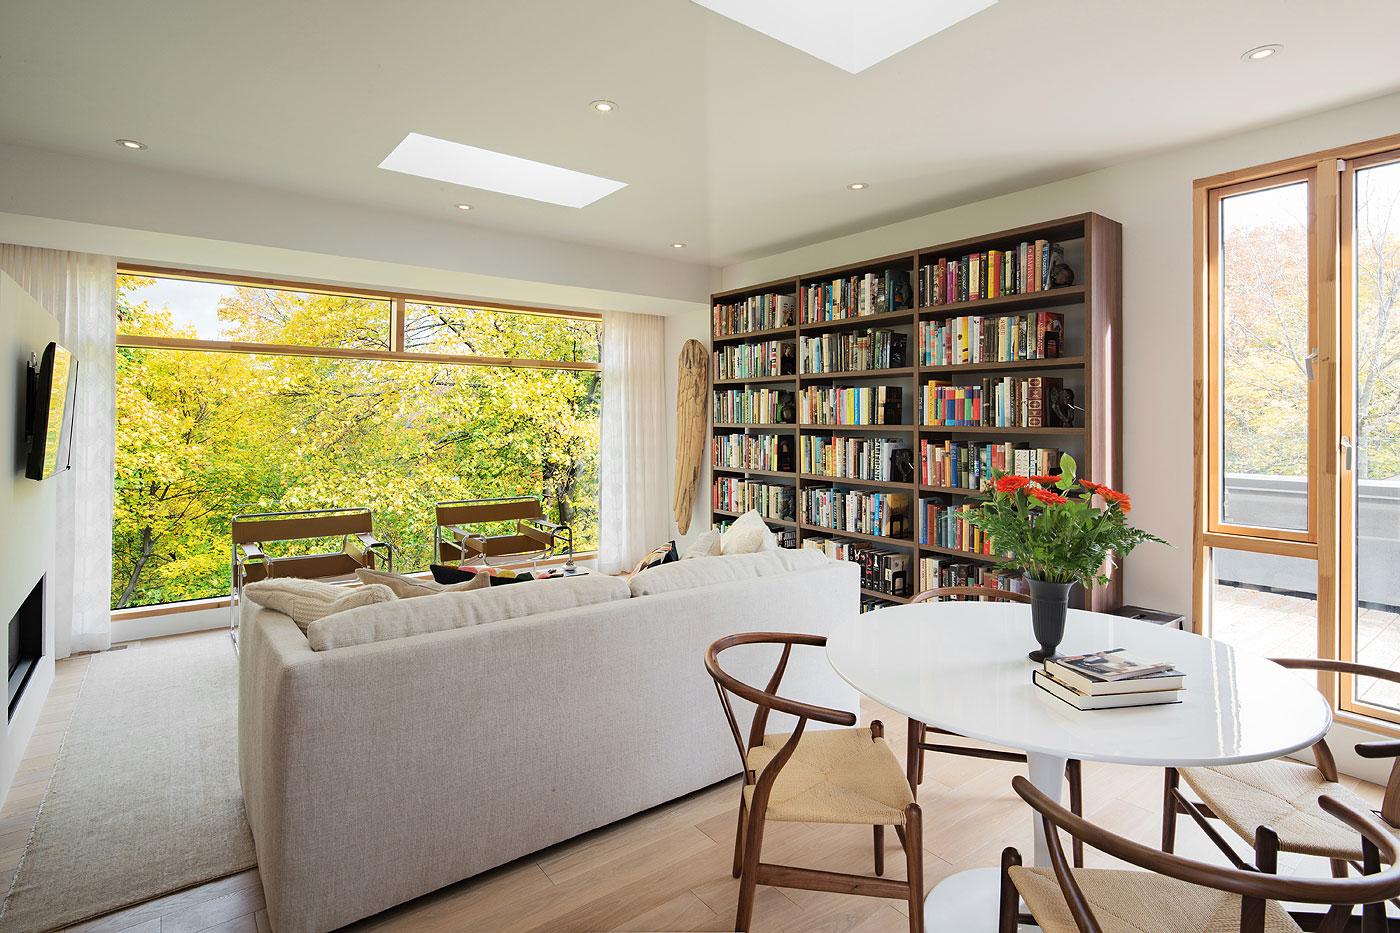 residencia-heathdale-tact-architecture-design (5)